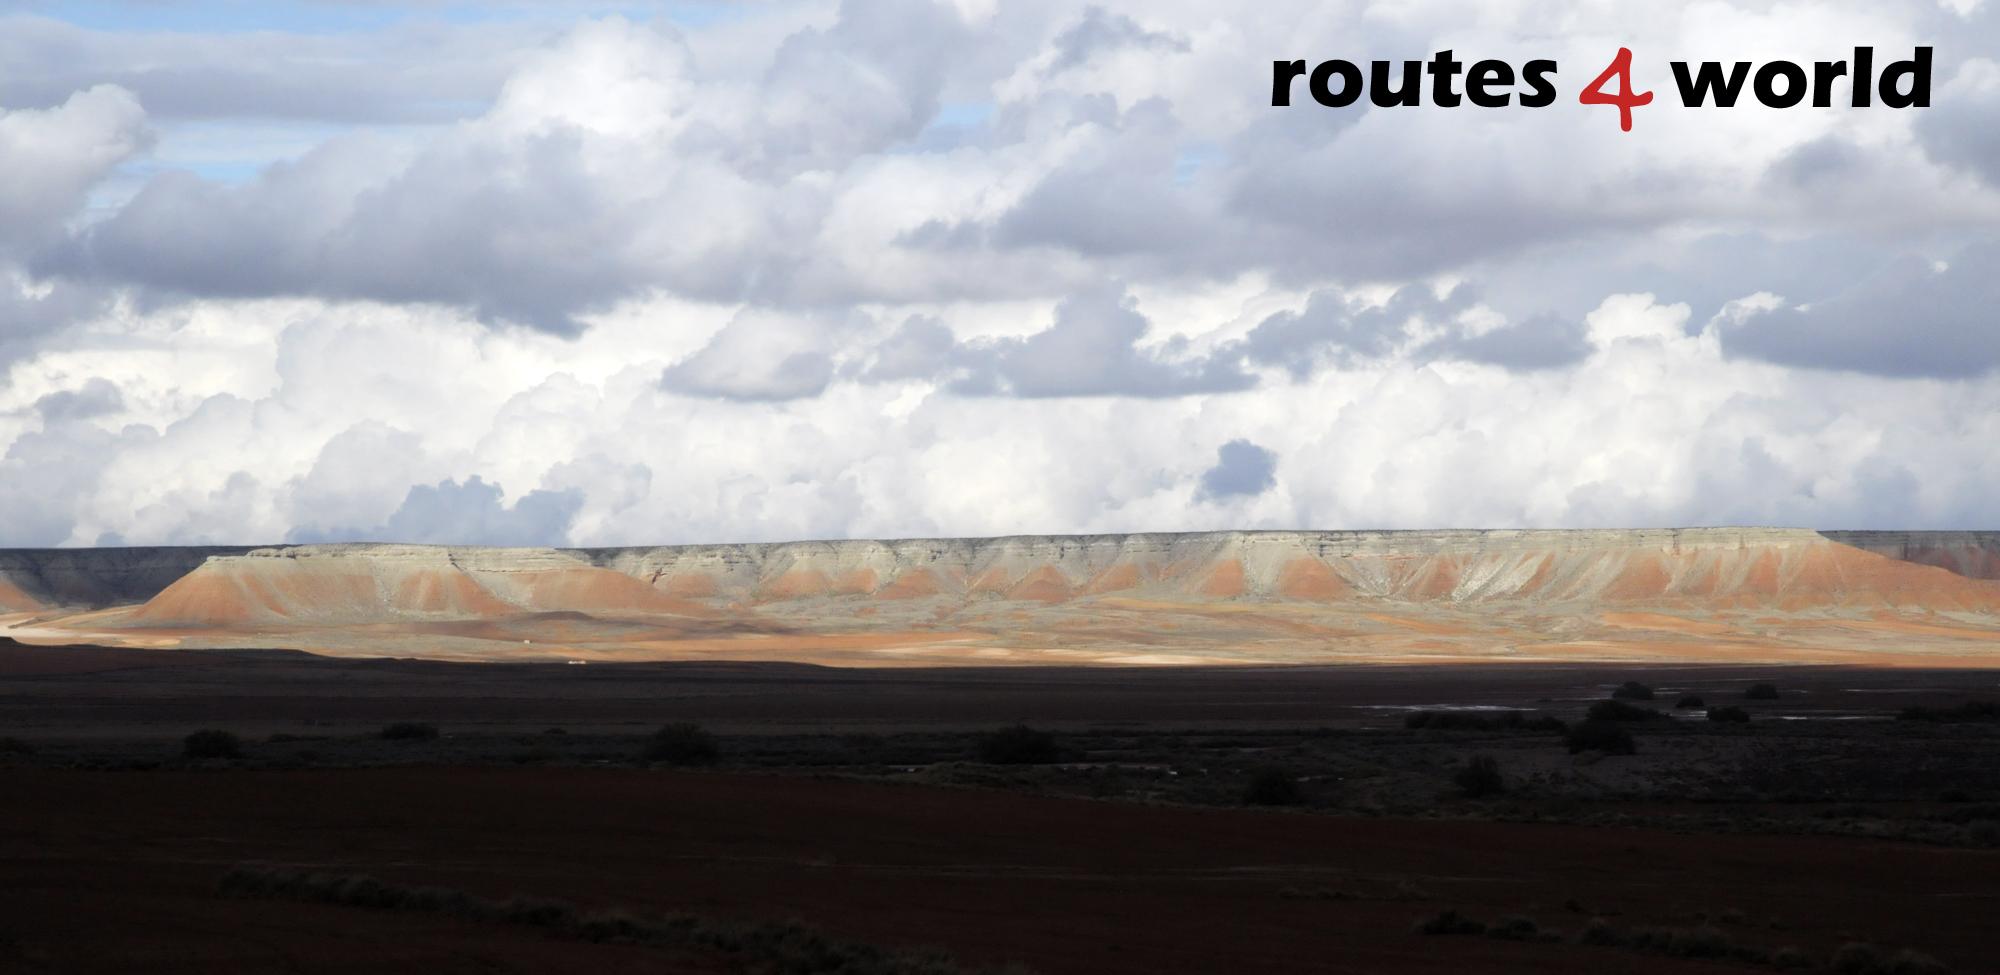 Monegros R4W - routes4world (12)